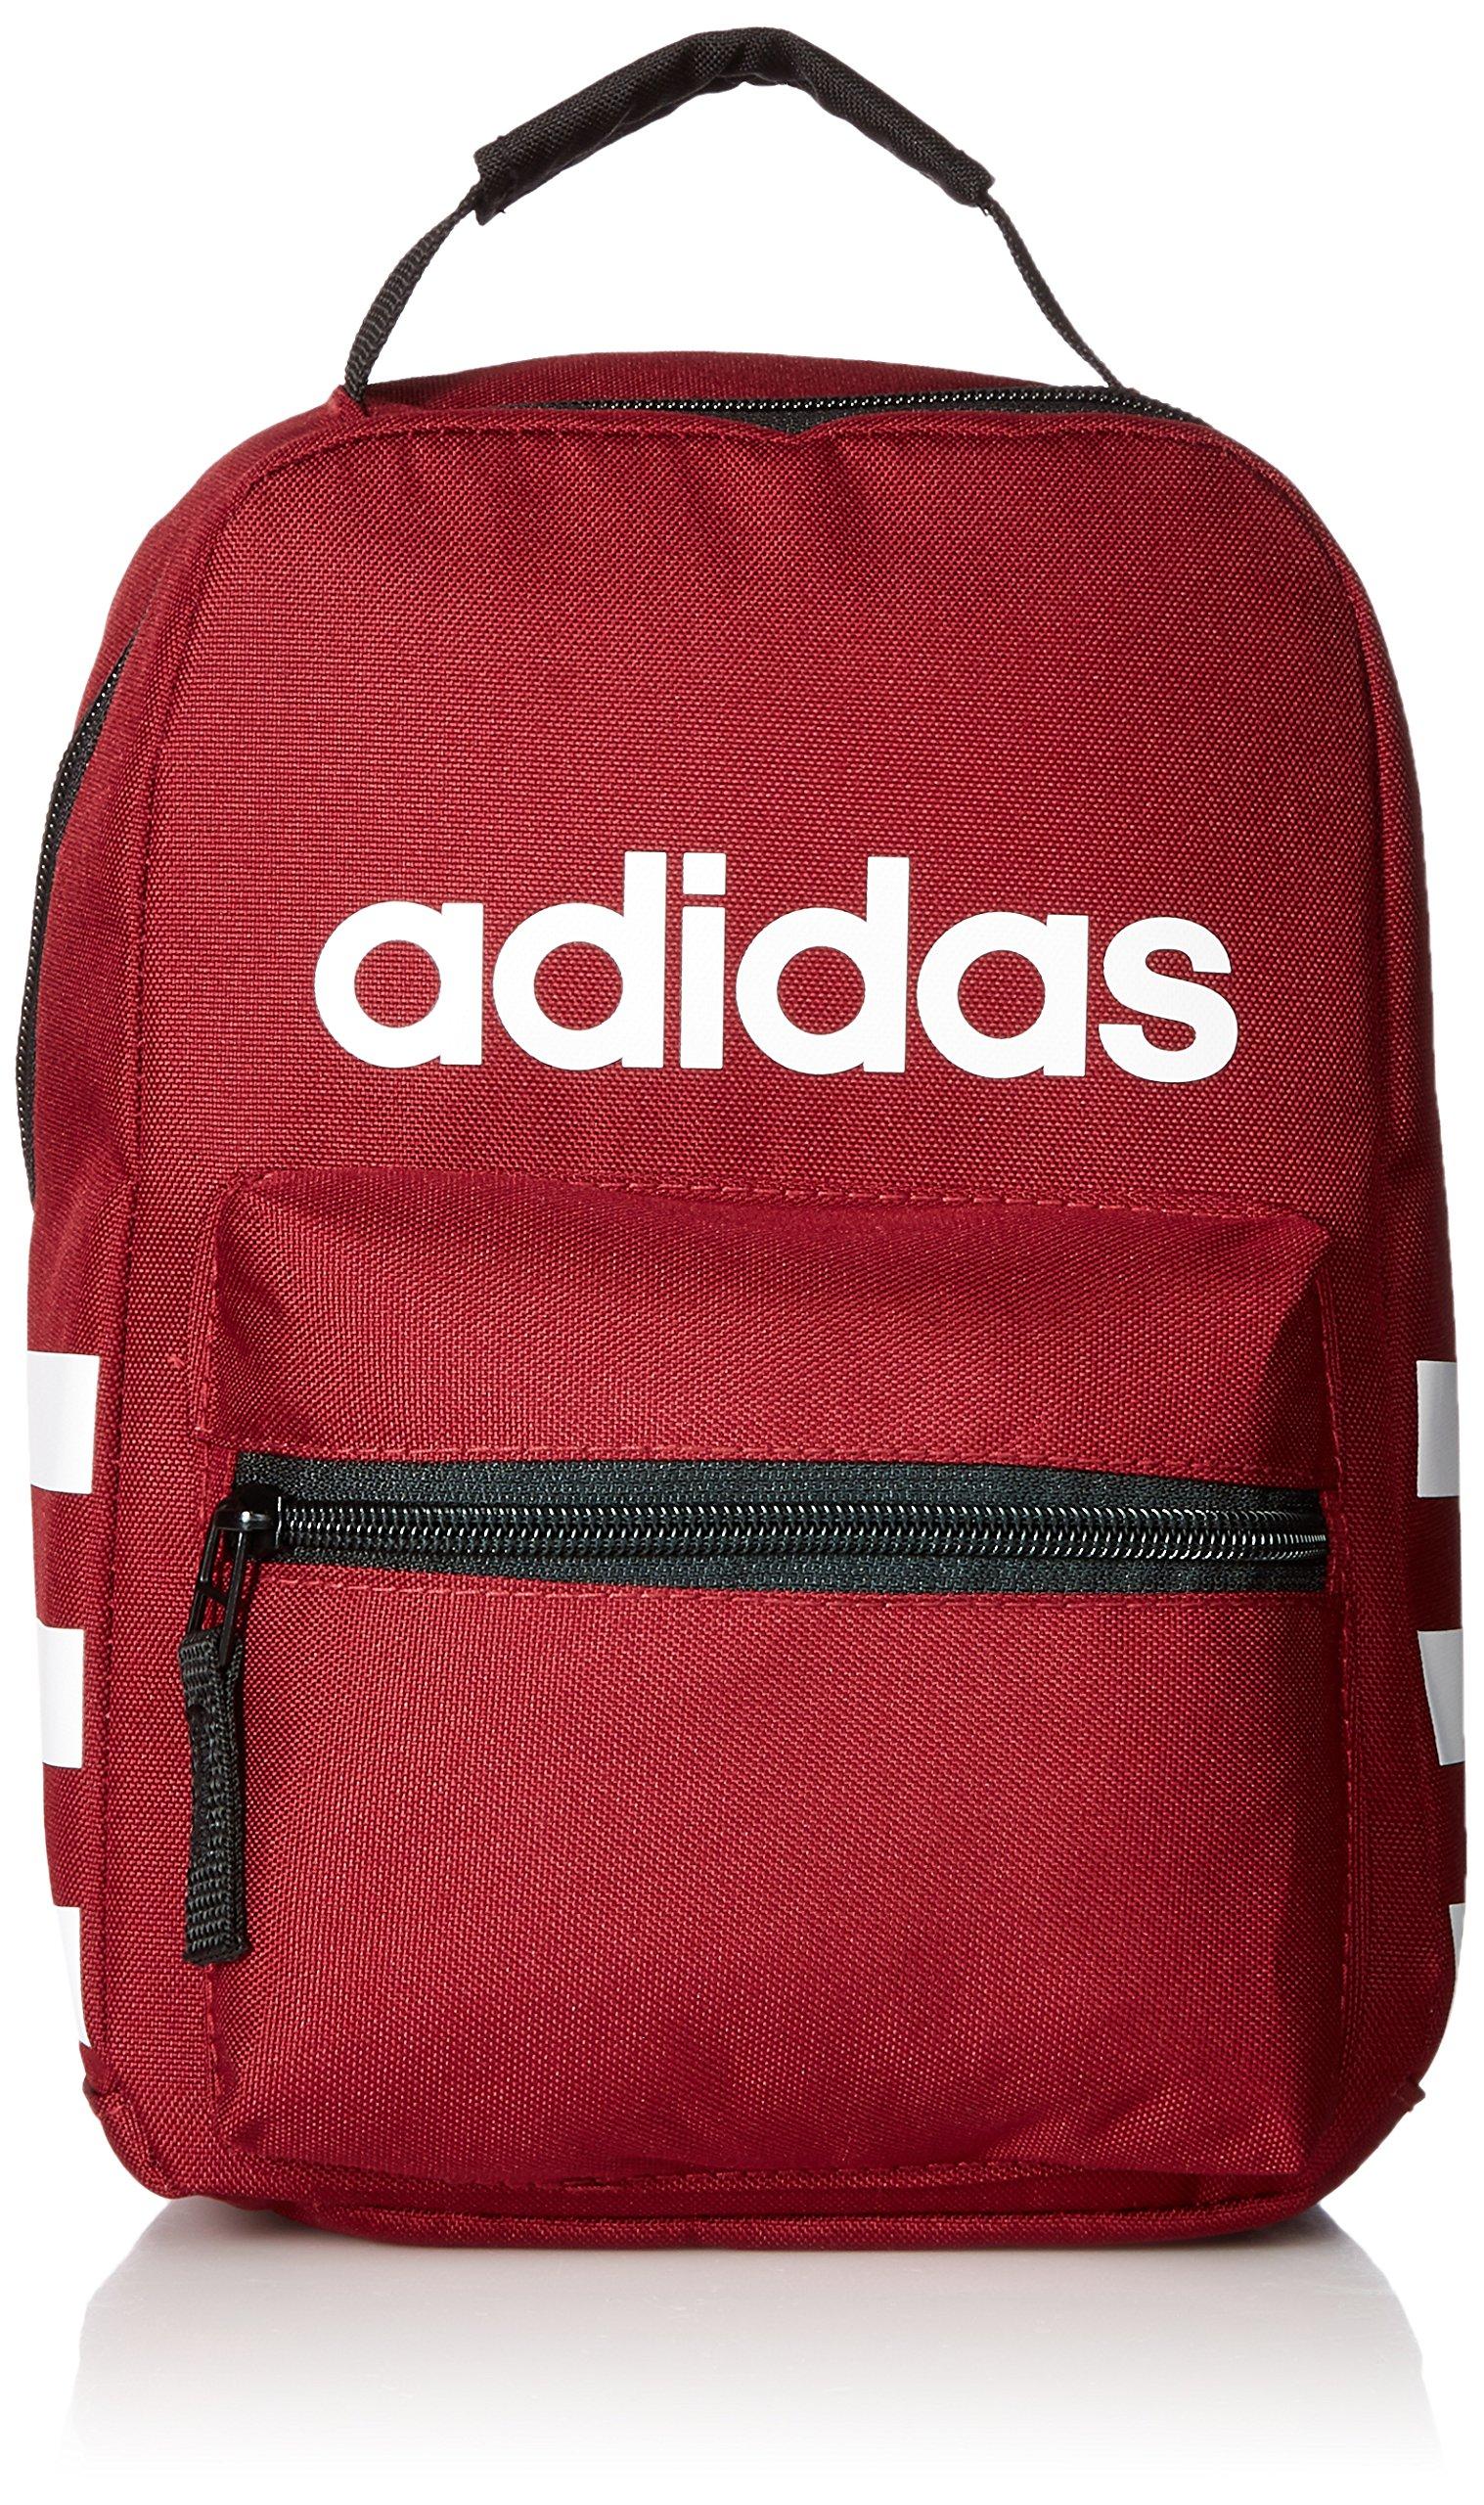 adidas Santiago Lunch Bag, Dark Red, One Size